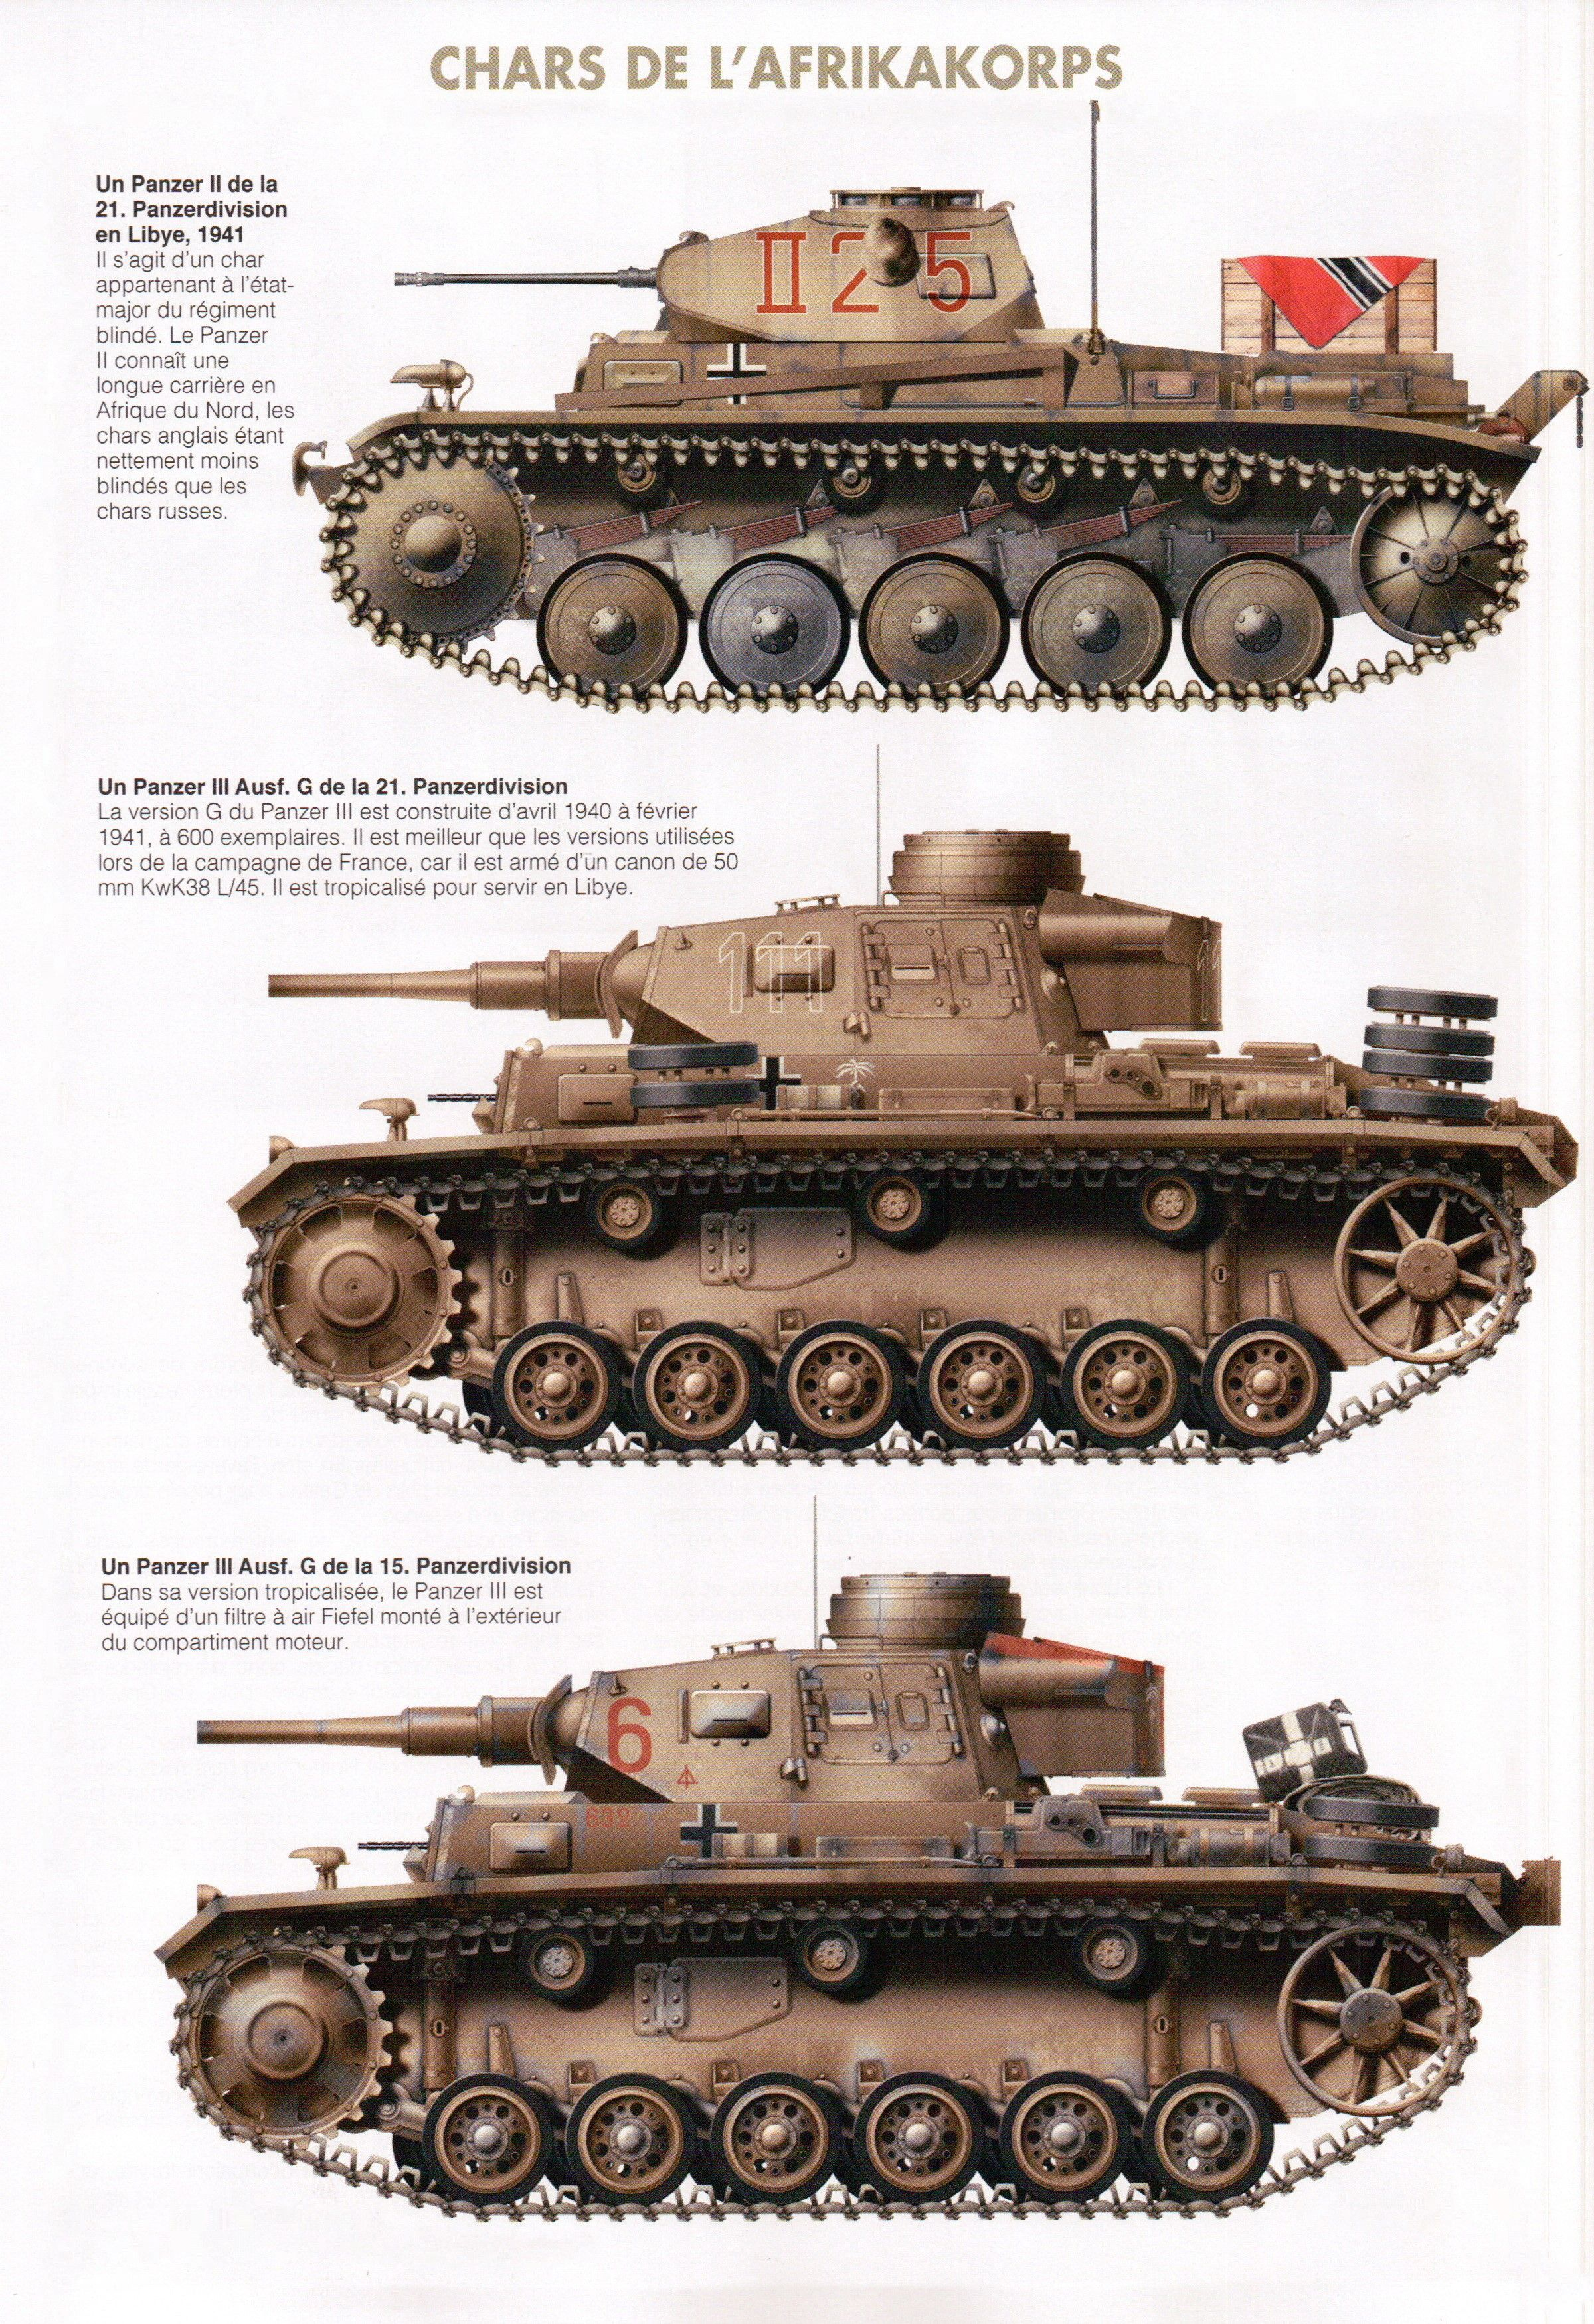 CHARS DE L'AFRIKAKORPS | The Mailed Fist | Ww2 tanks